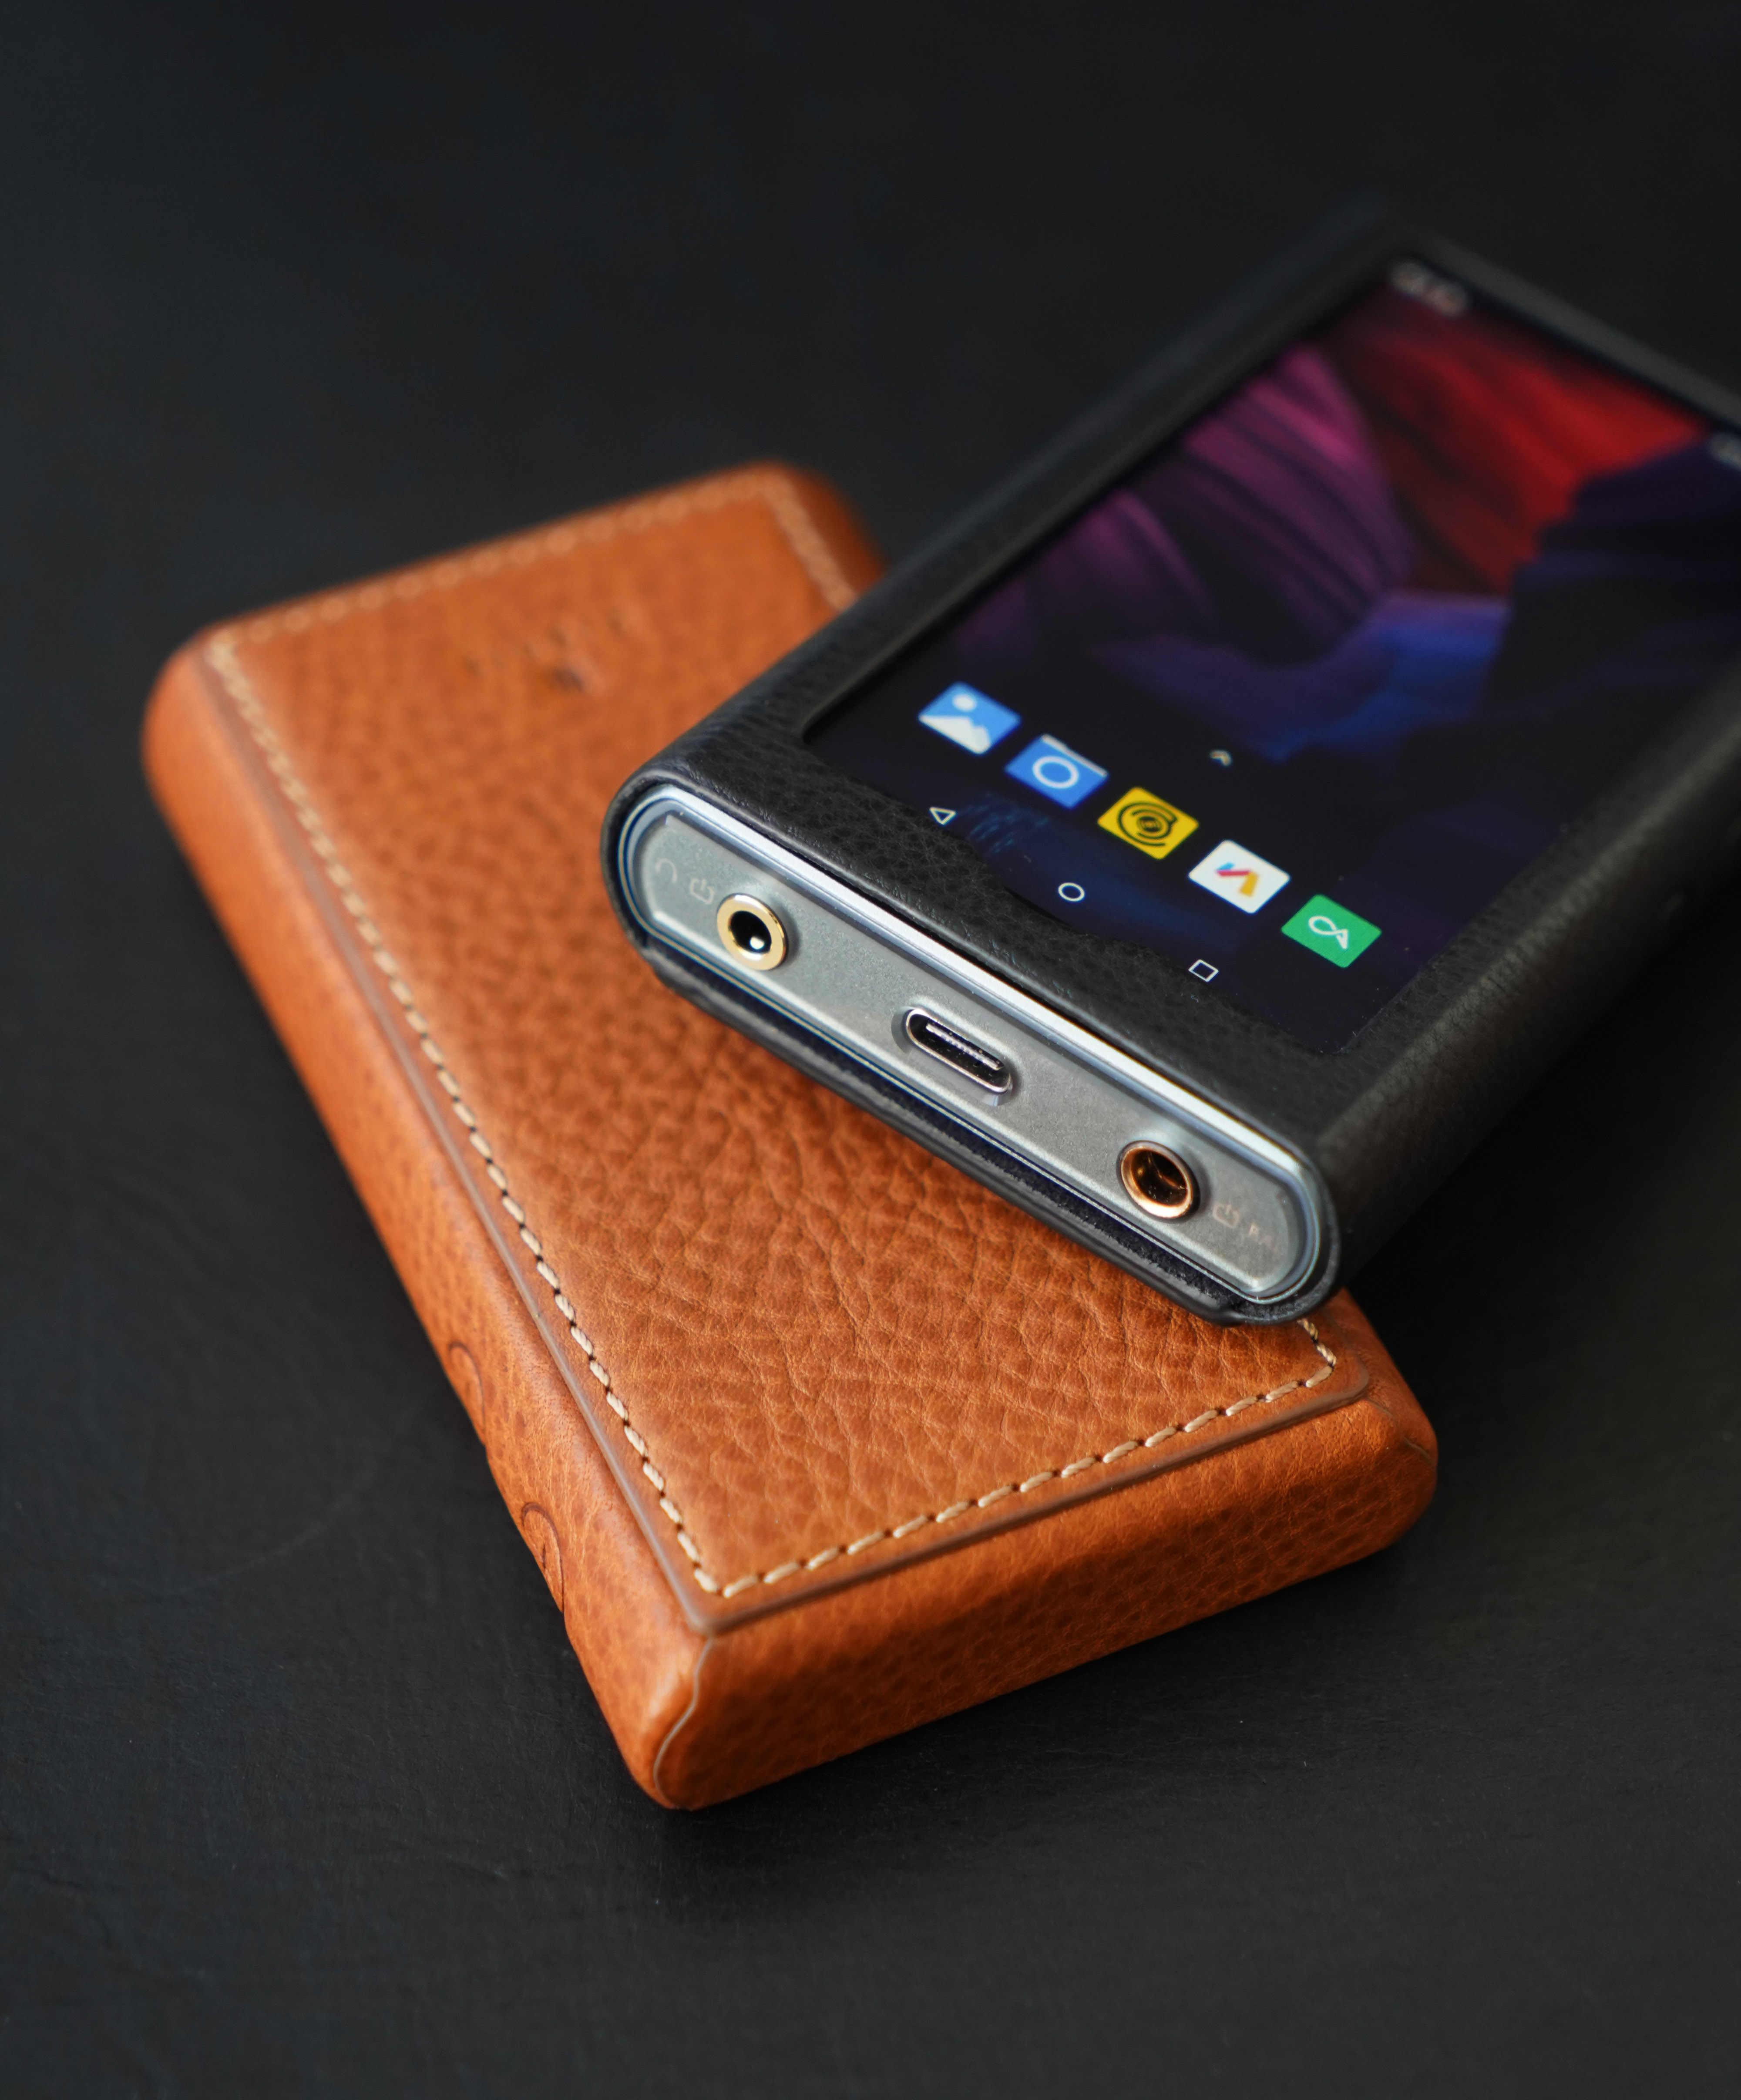 Dignis עור מקרה עבור HiBy R5 ברזולוציה גבוהה אודיו נייד נגן היי-Res מוסיקה נגן Bluetooth MP3 נגן HiFi